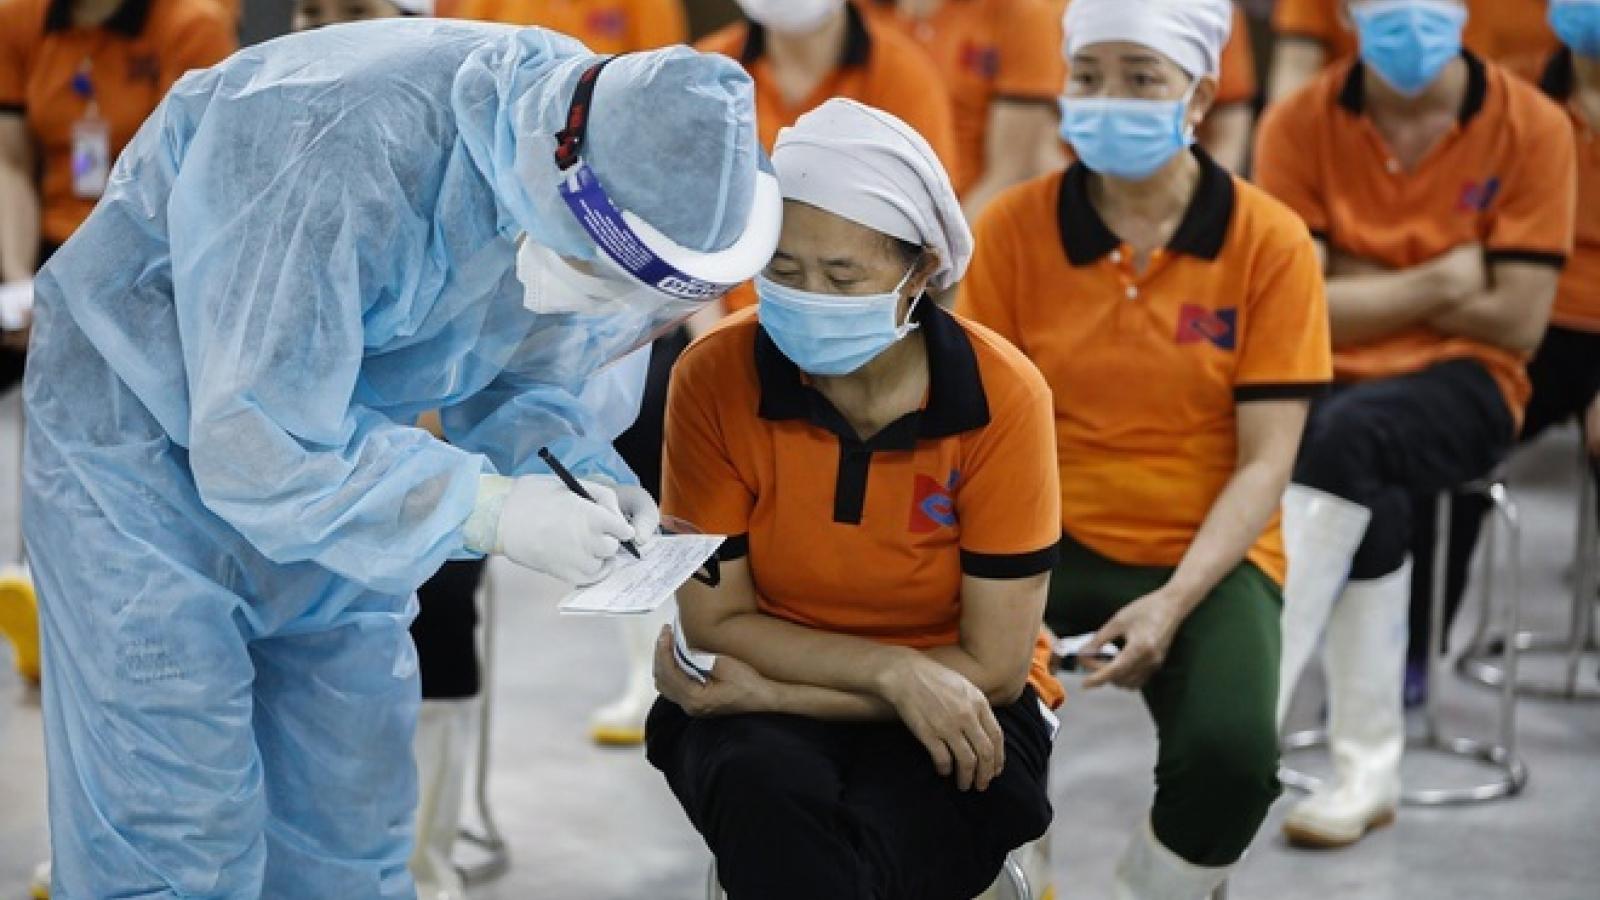 Firms face labour shortage after social distancing